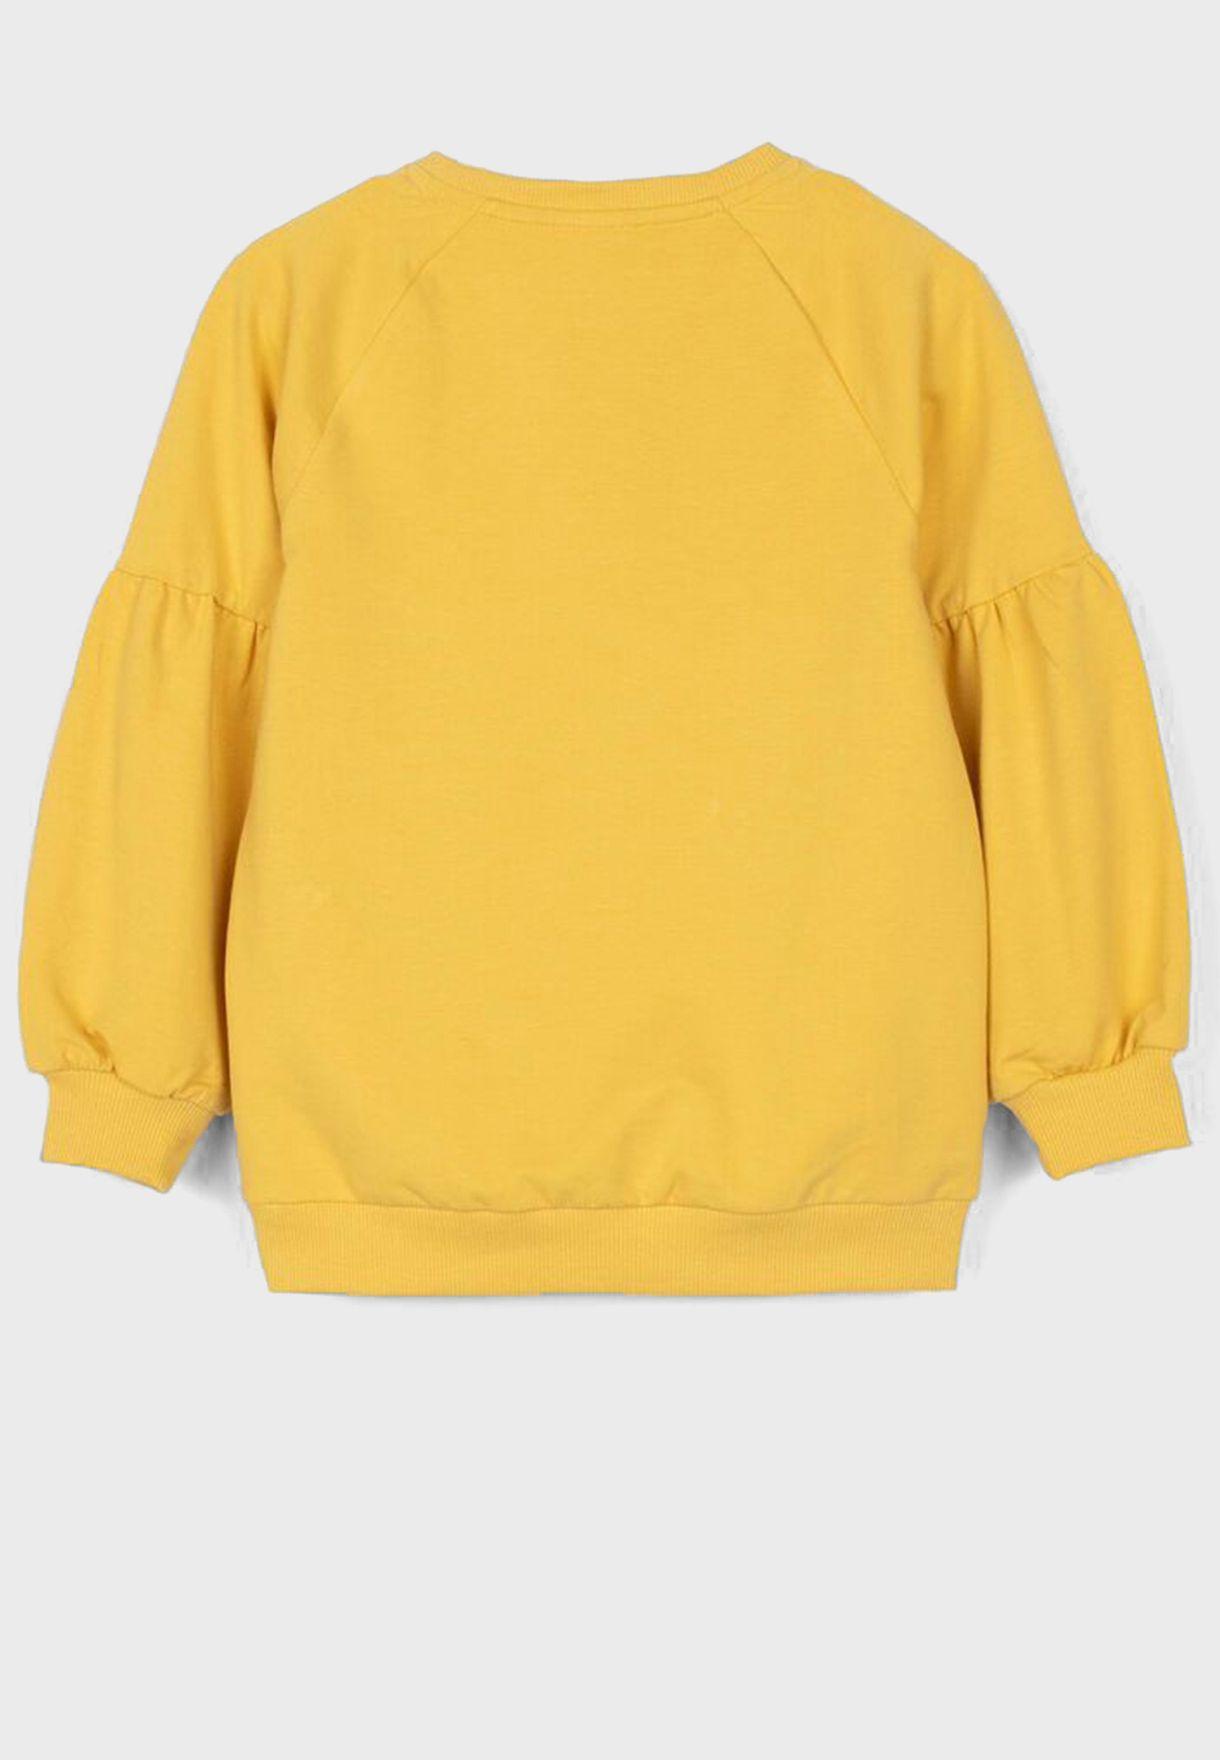 Kids Graphic Puss Sleeve Sweatshirt